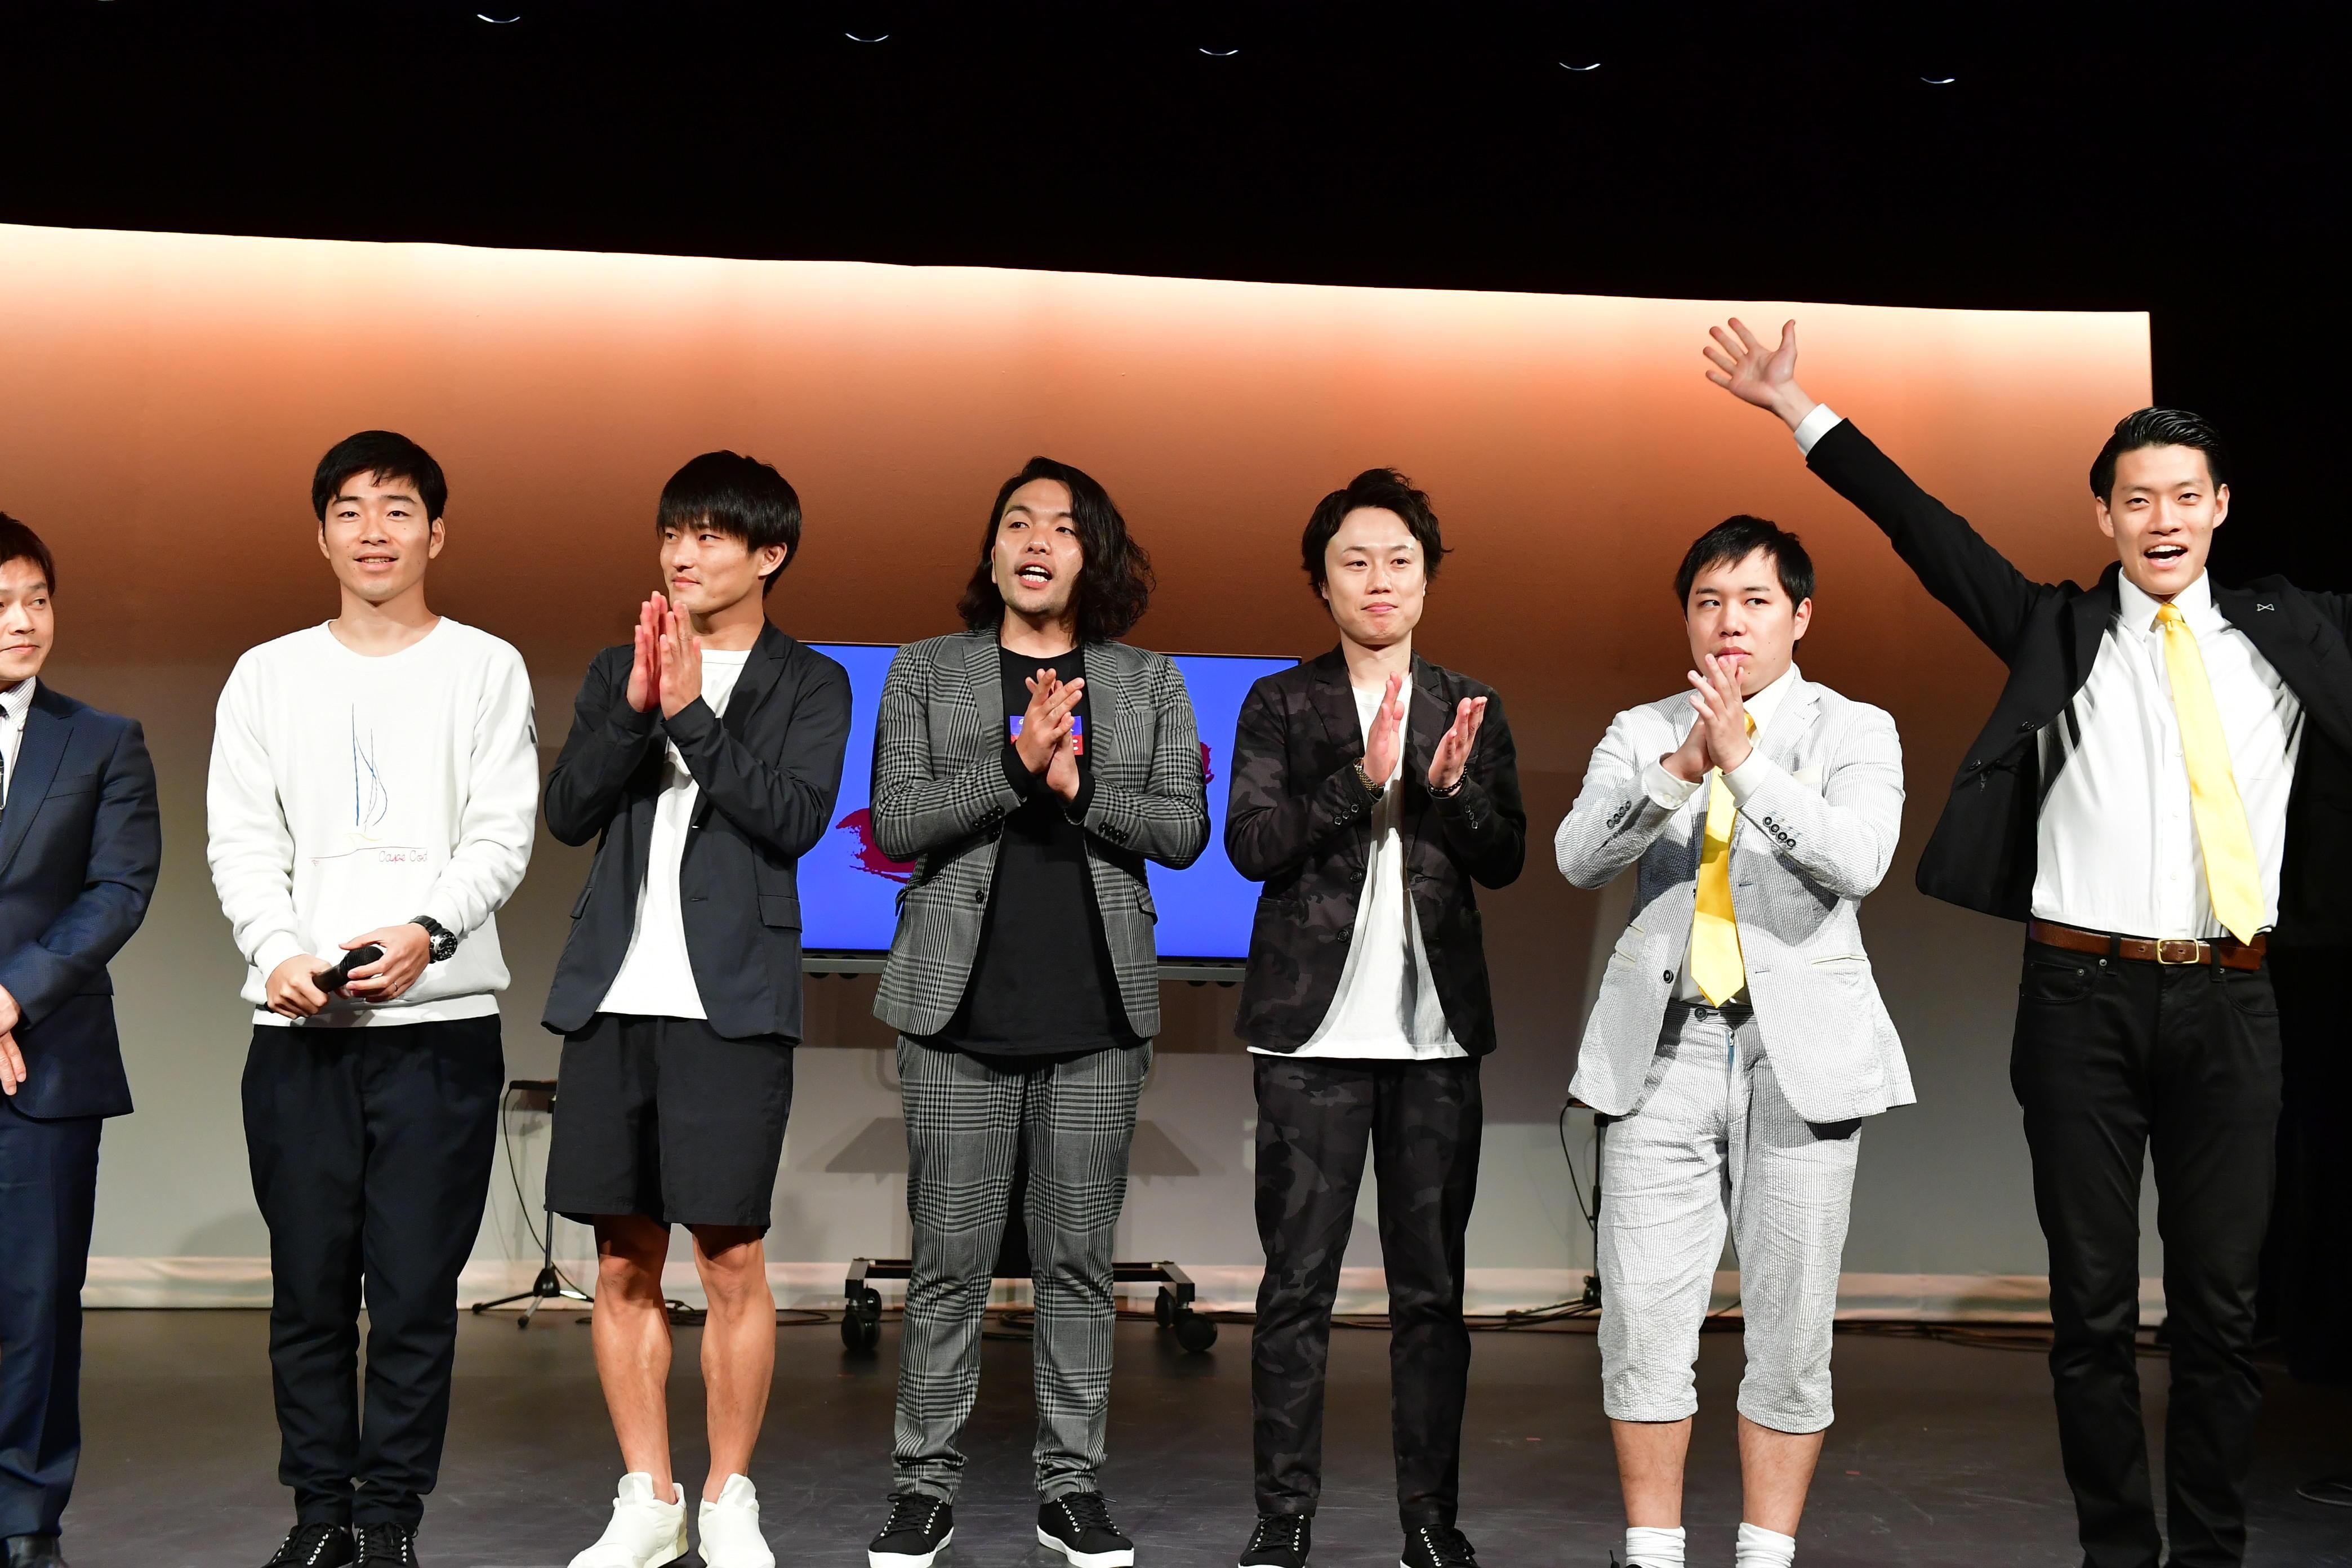 http://news.yoshimoto.co.jp/20181206203605-92d307fd2e17263cae23561405c70fc0cdd2d598.jpg